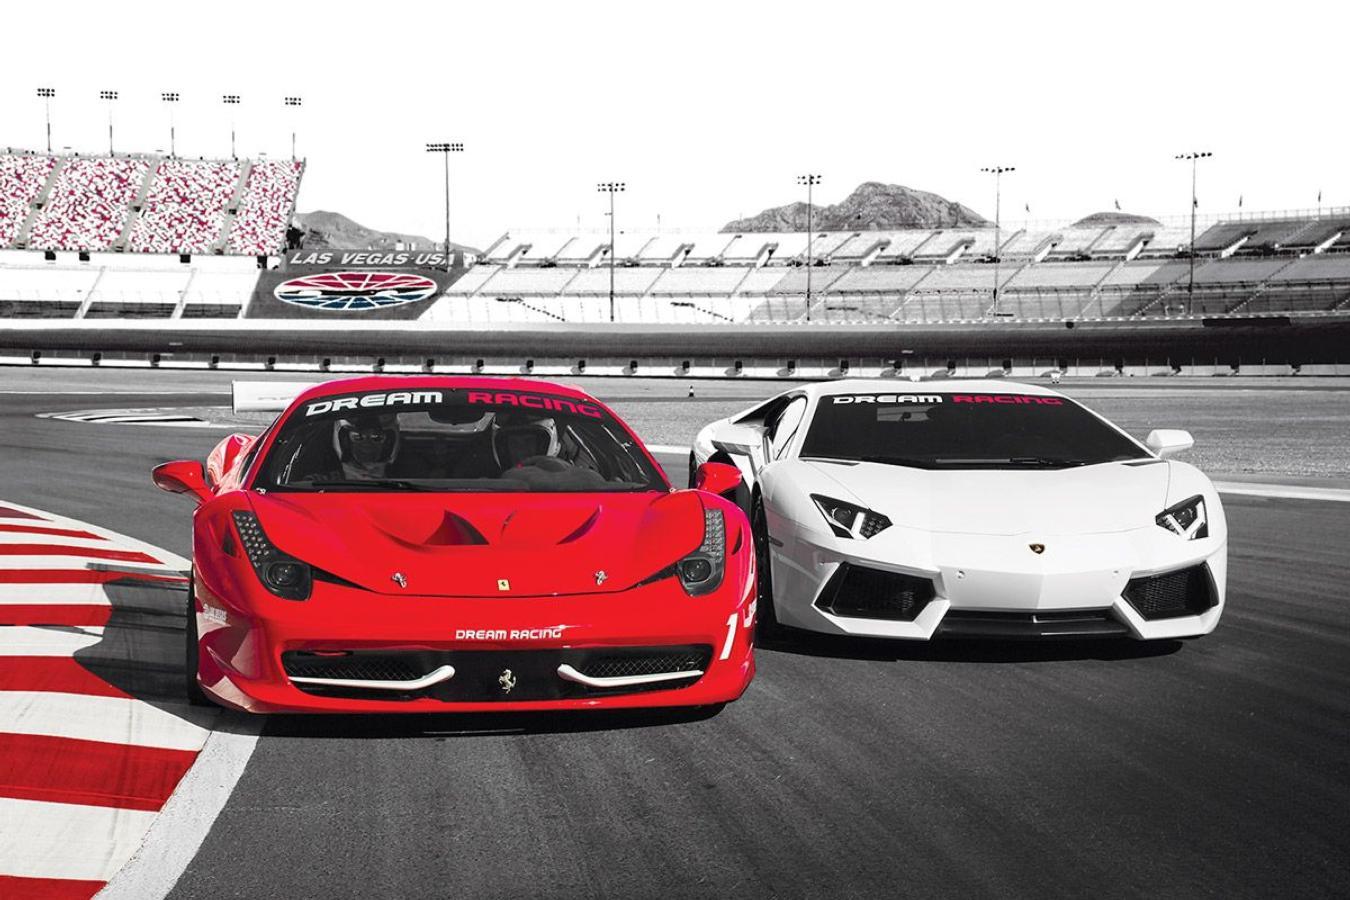 Dream racing experiences las vegas motor speedway for Las vegas motor speedway transportation